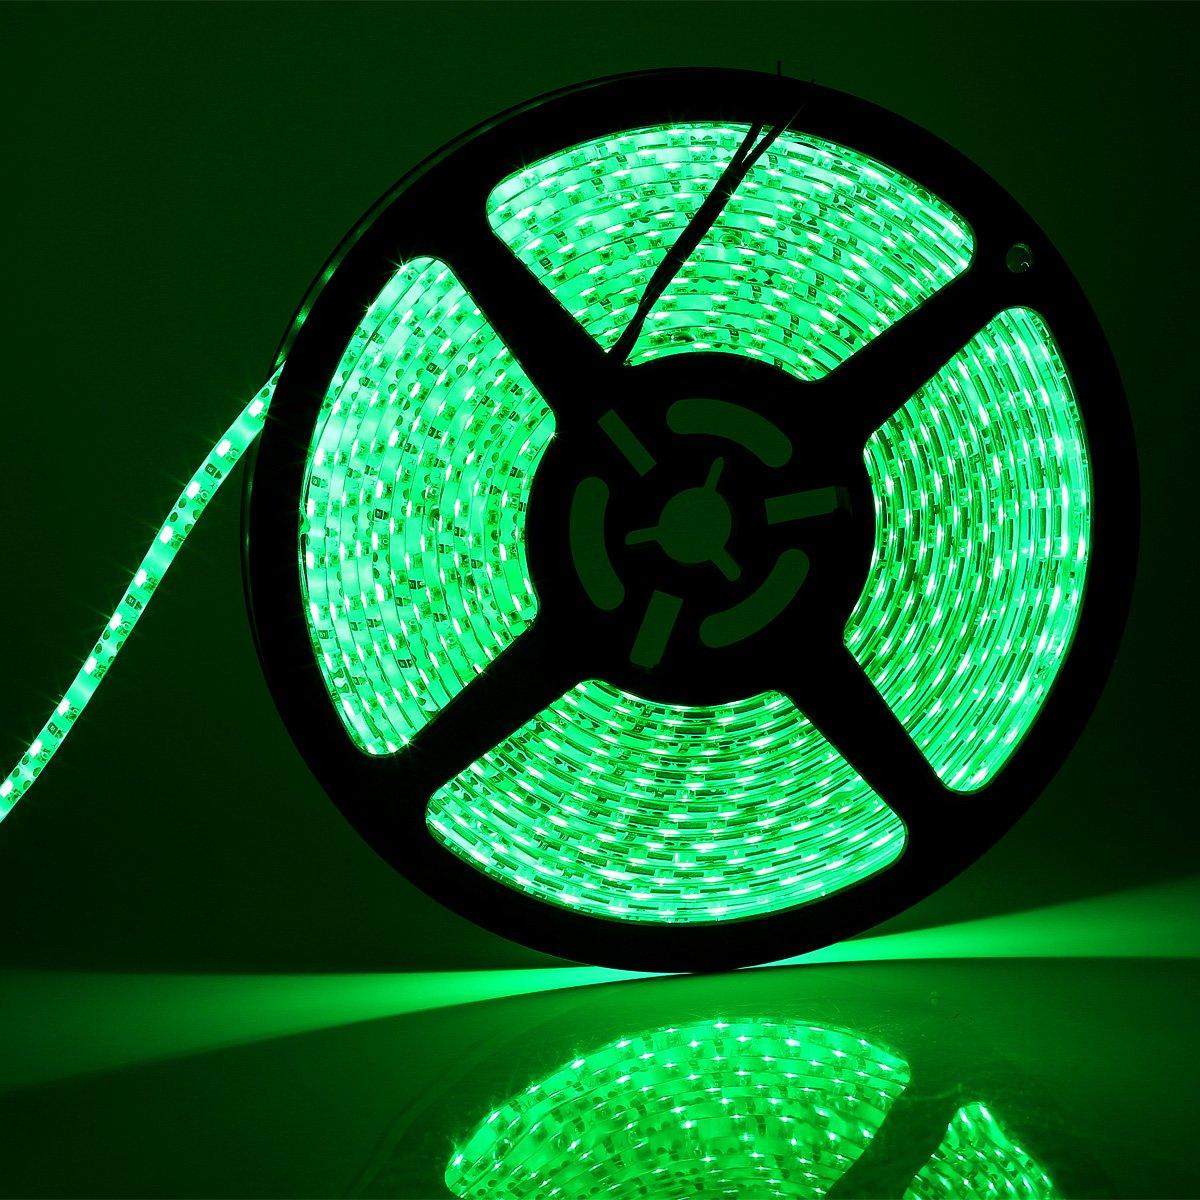 SUPERNIGHT High Density Green Waterproof Led Light Strip, SMD 3528, 5 Meter or 16 Ft LED Strip 120 Leds/M by SUPERNIGHT (Image #1)